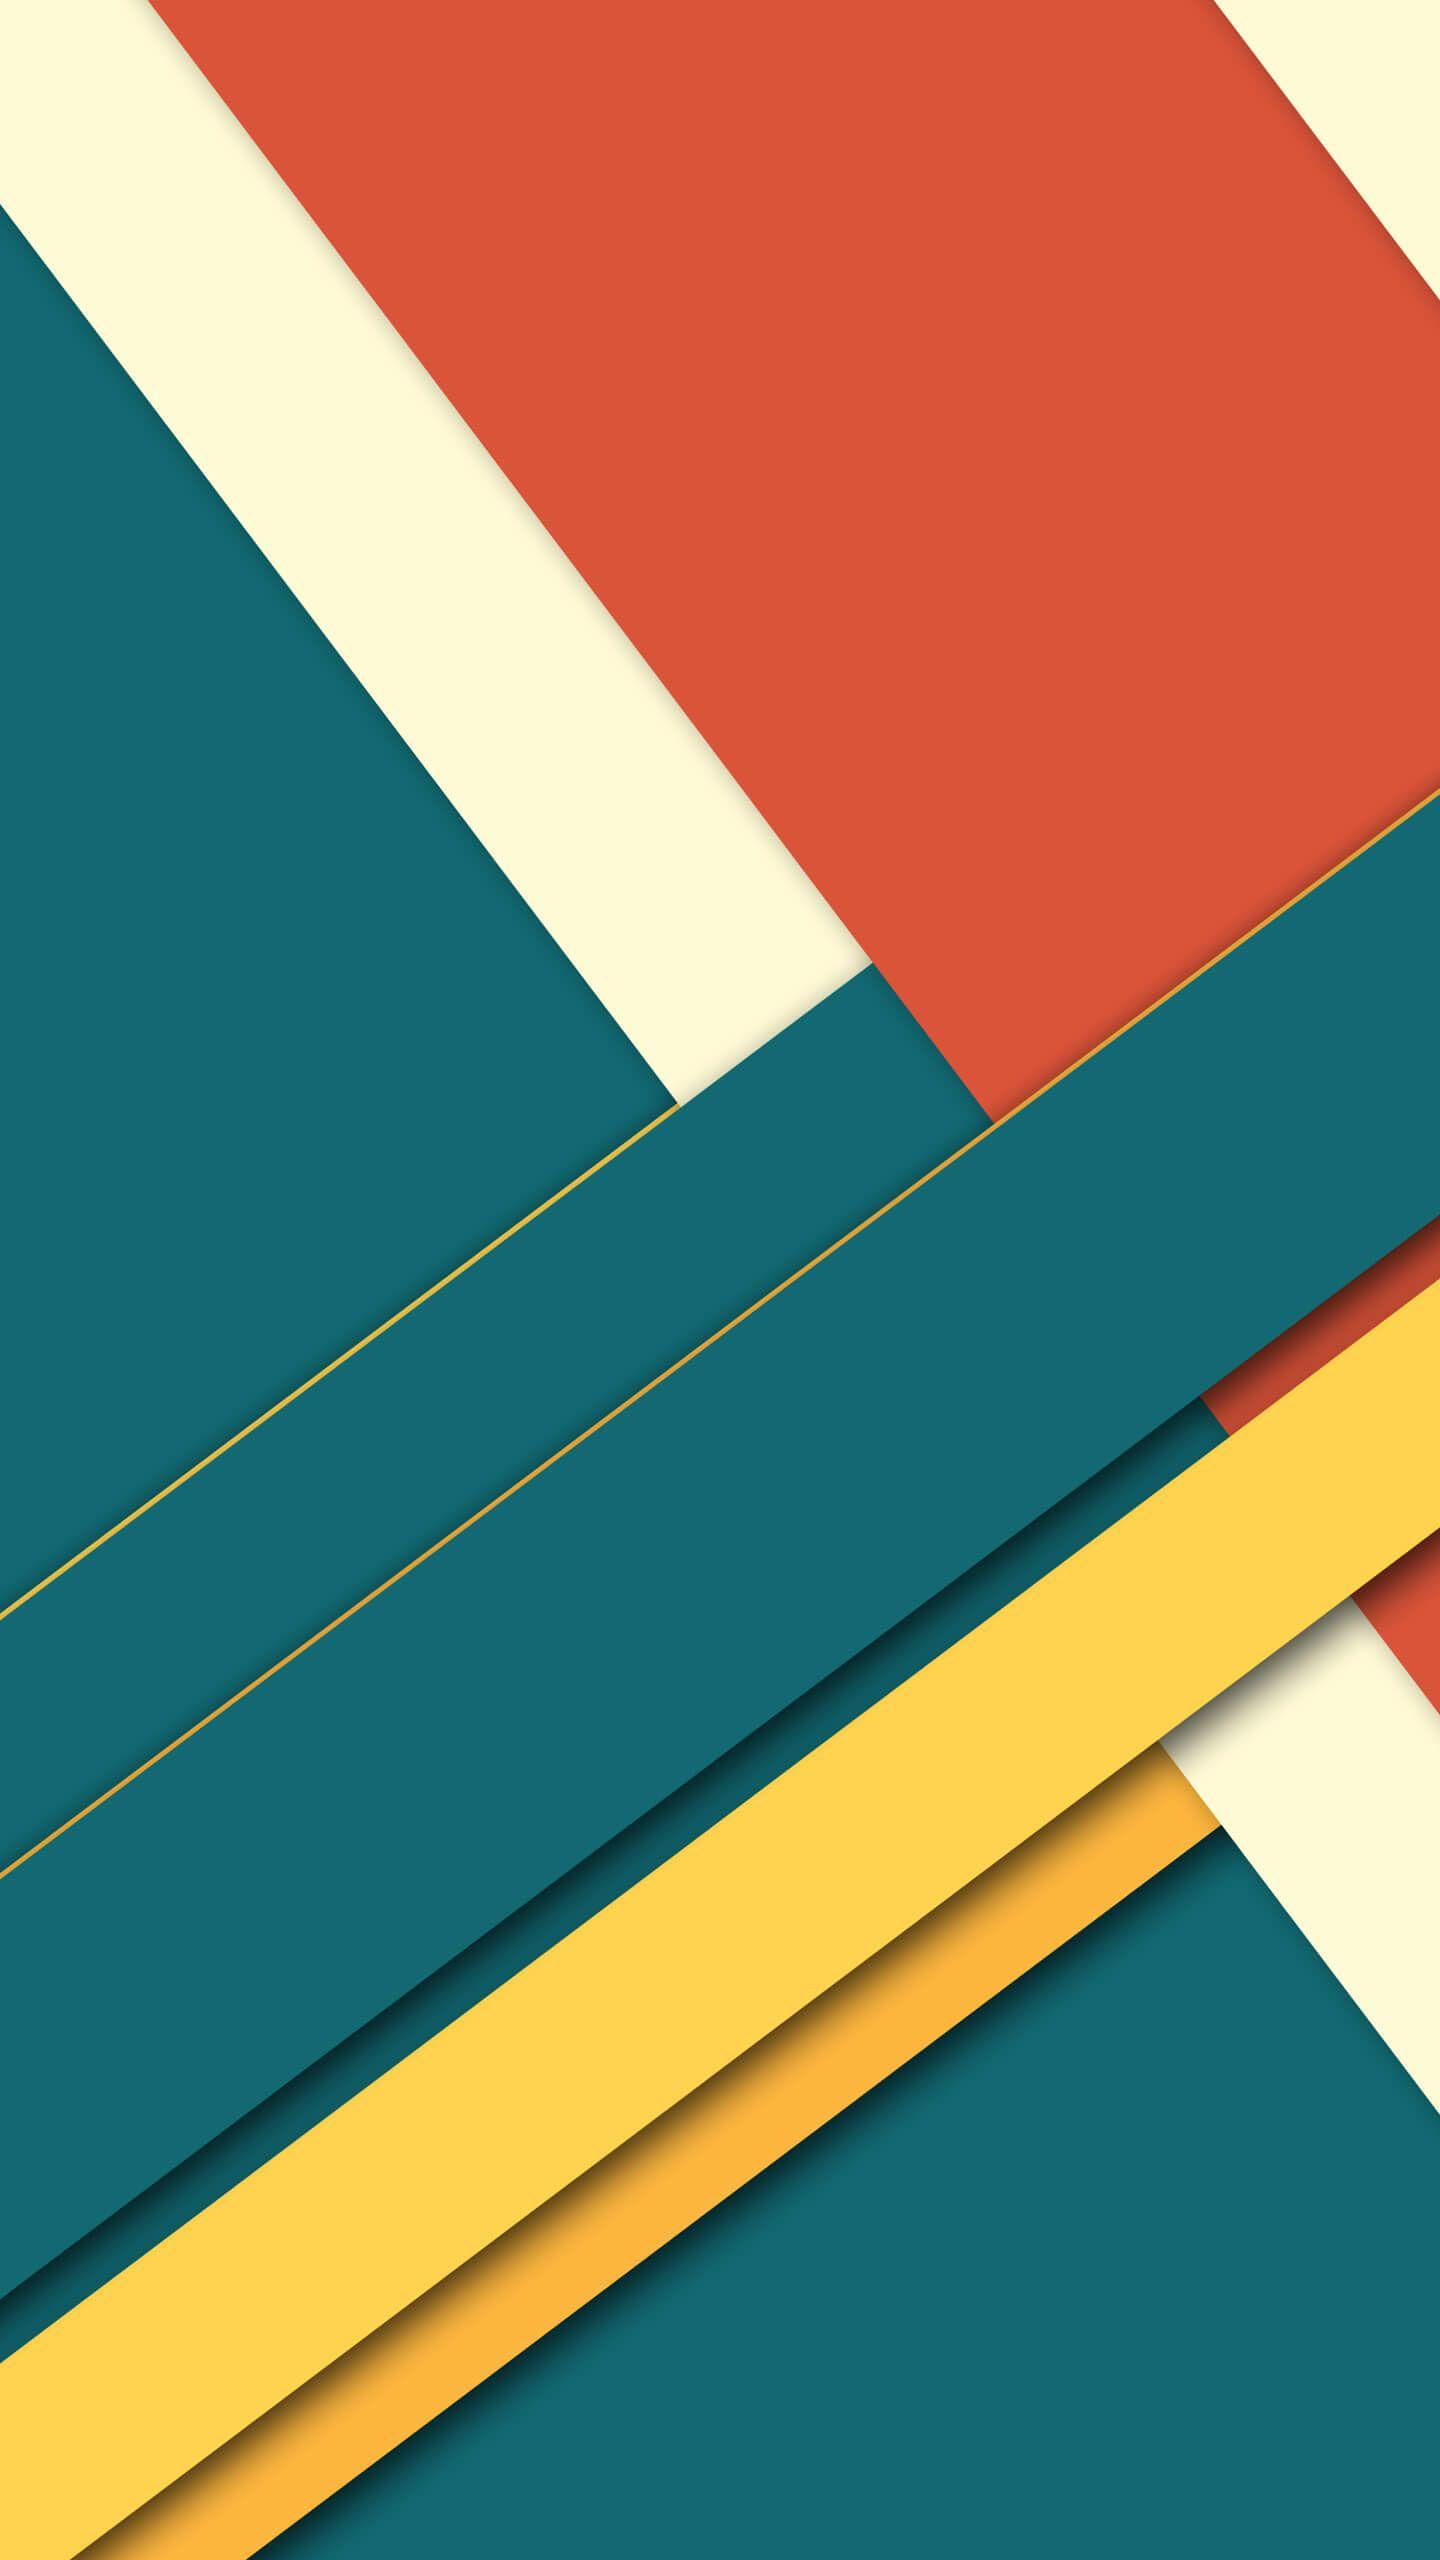 Http Www Vactualpapers Com Gallery Qhd 1440x2560 Material Design Mobile Wallpaper 53 Mobile Wallpaper Material Design Geometric Wallpaper